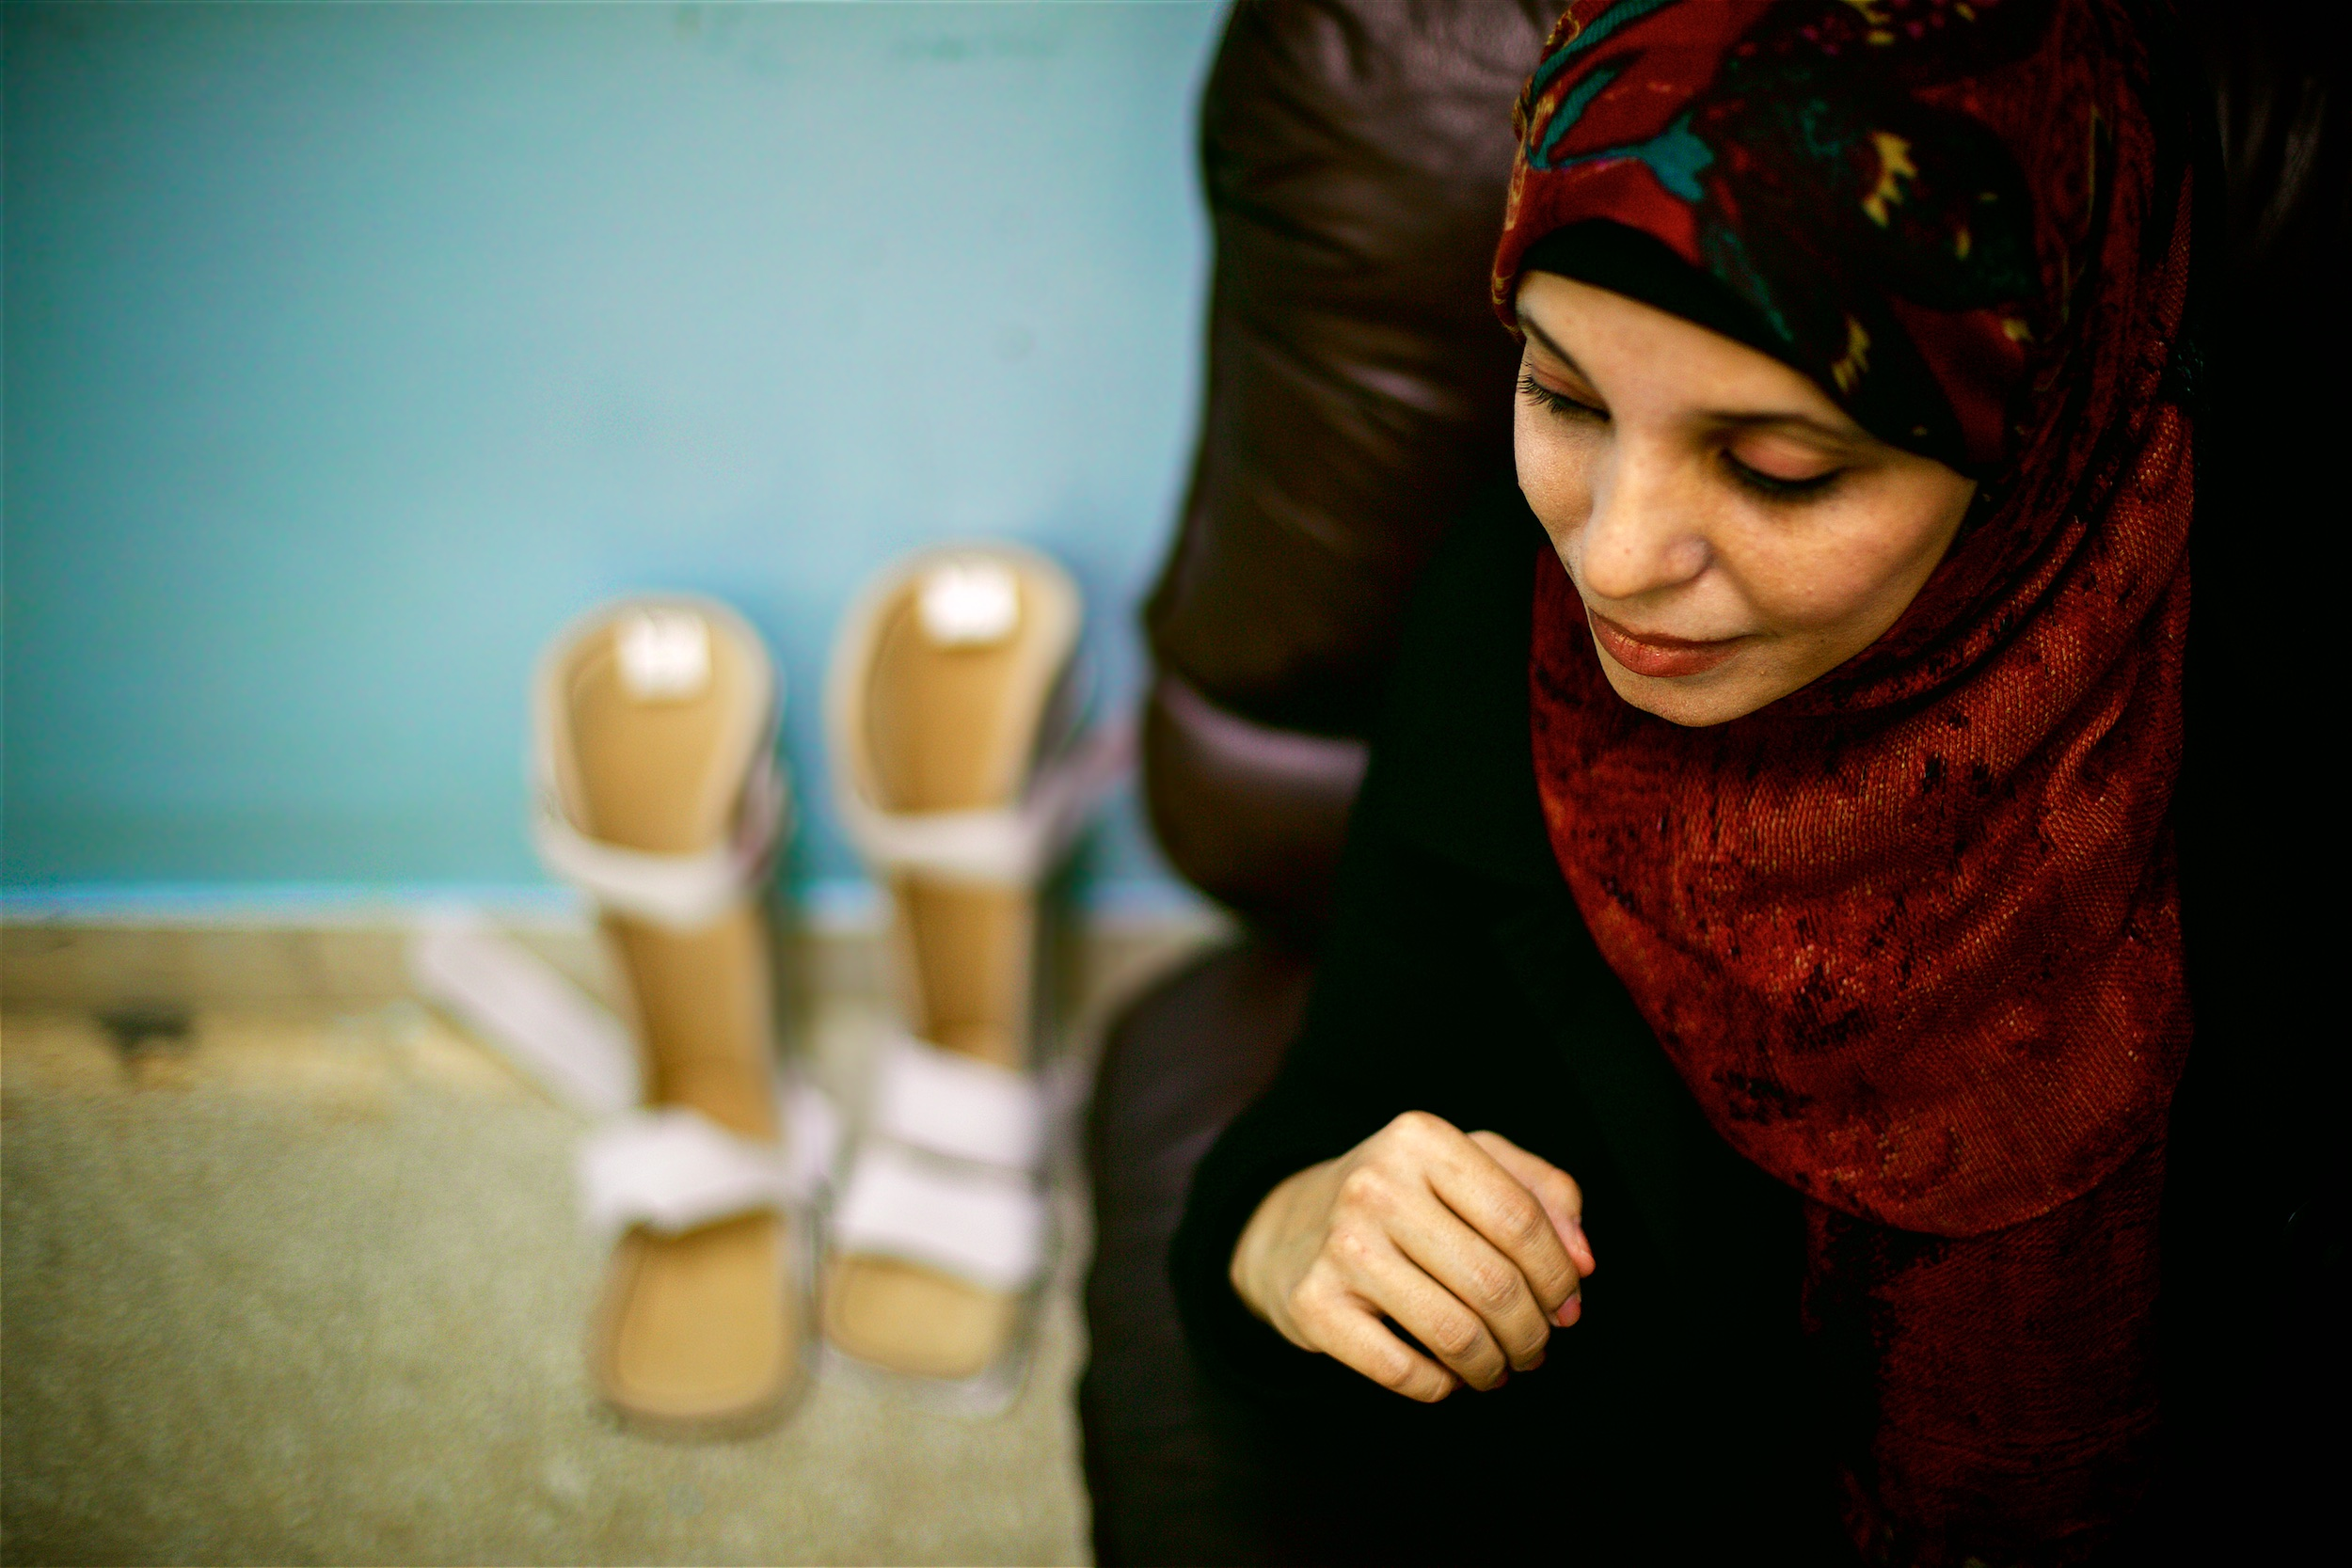 jordan-msf-al-ramtha-dectors-without-borders-war-hospital-refugee-camp-denis-bosnic-31.jpg